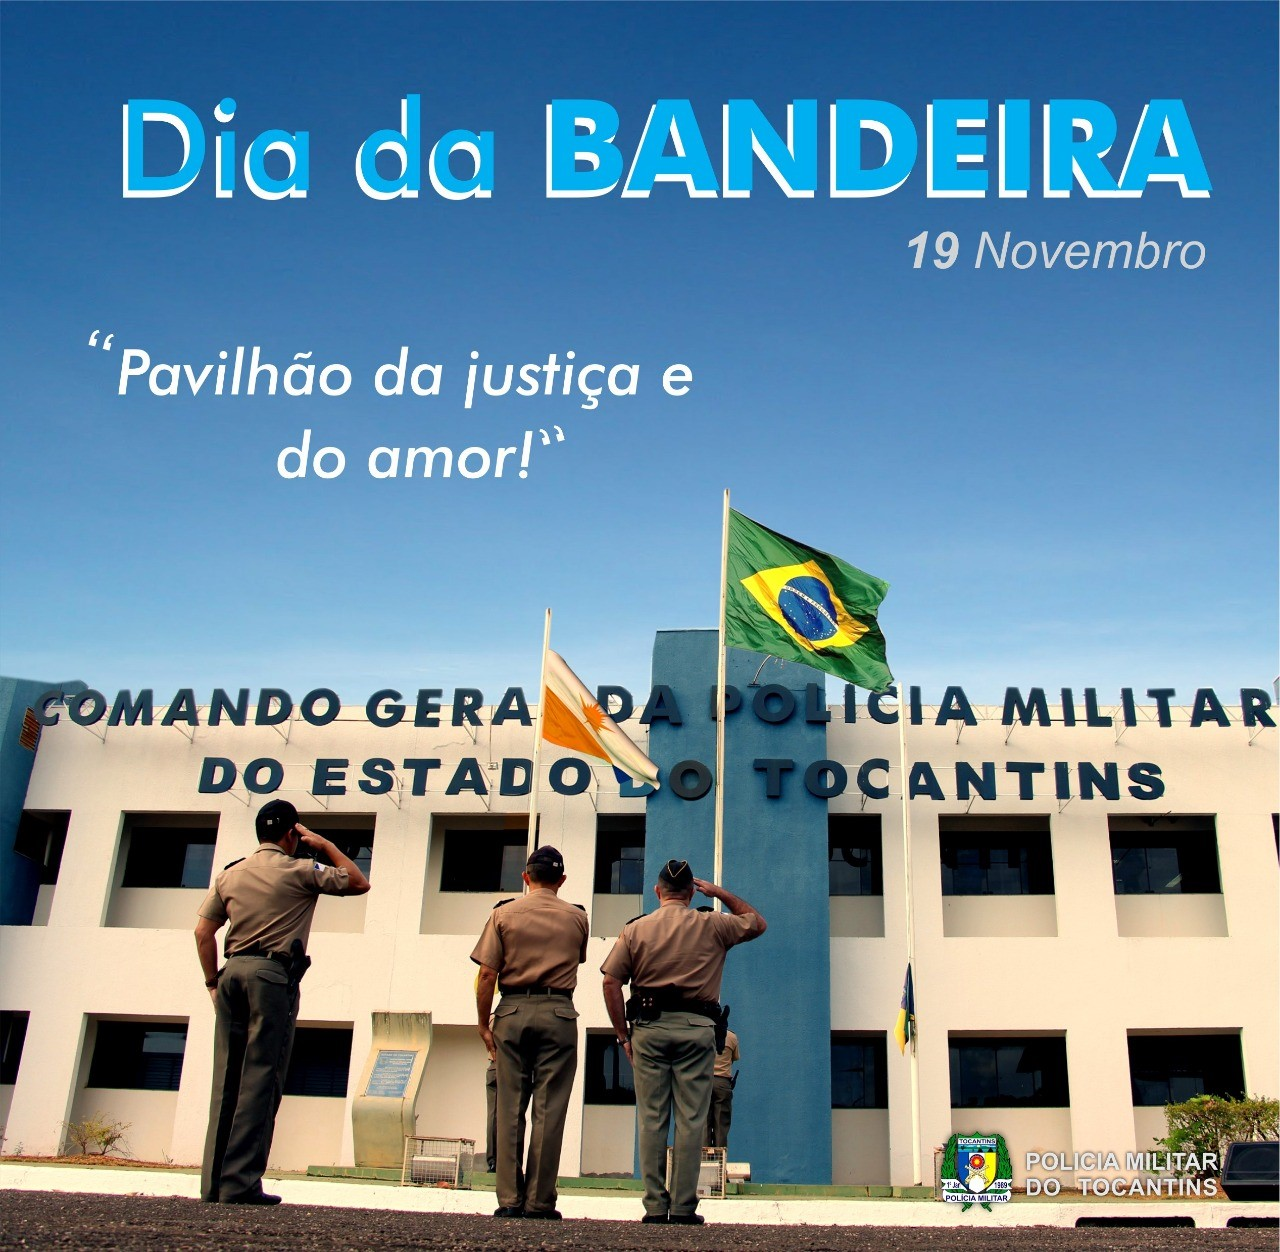 Dia da Bandeira é comemorado por unidades militares no Tocantins